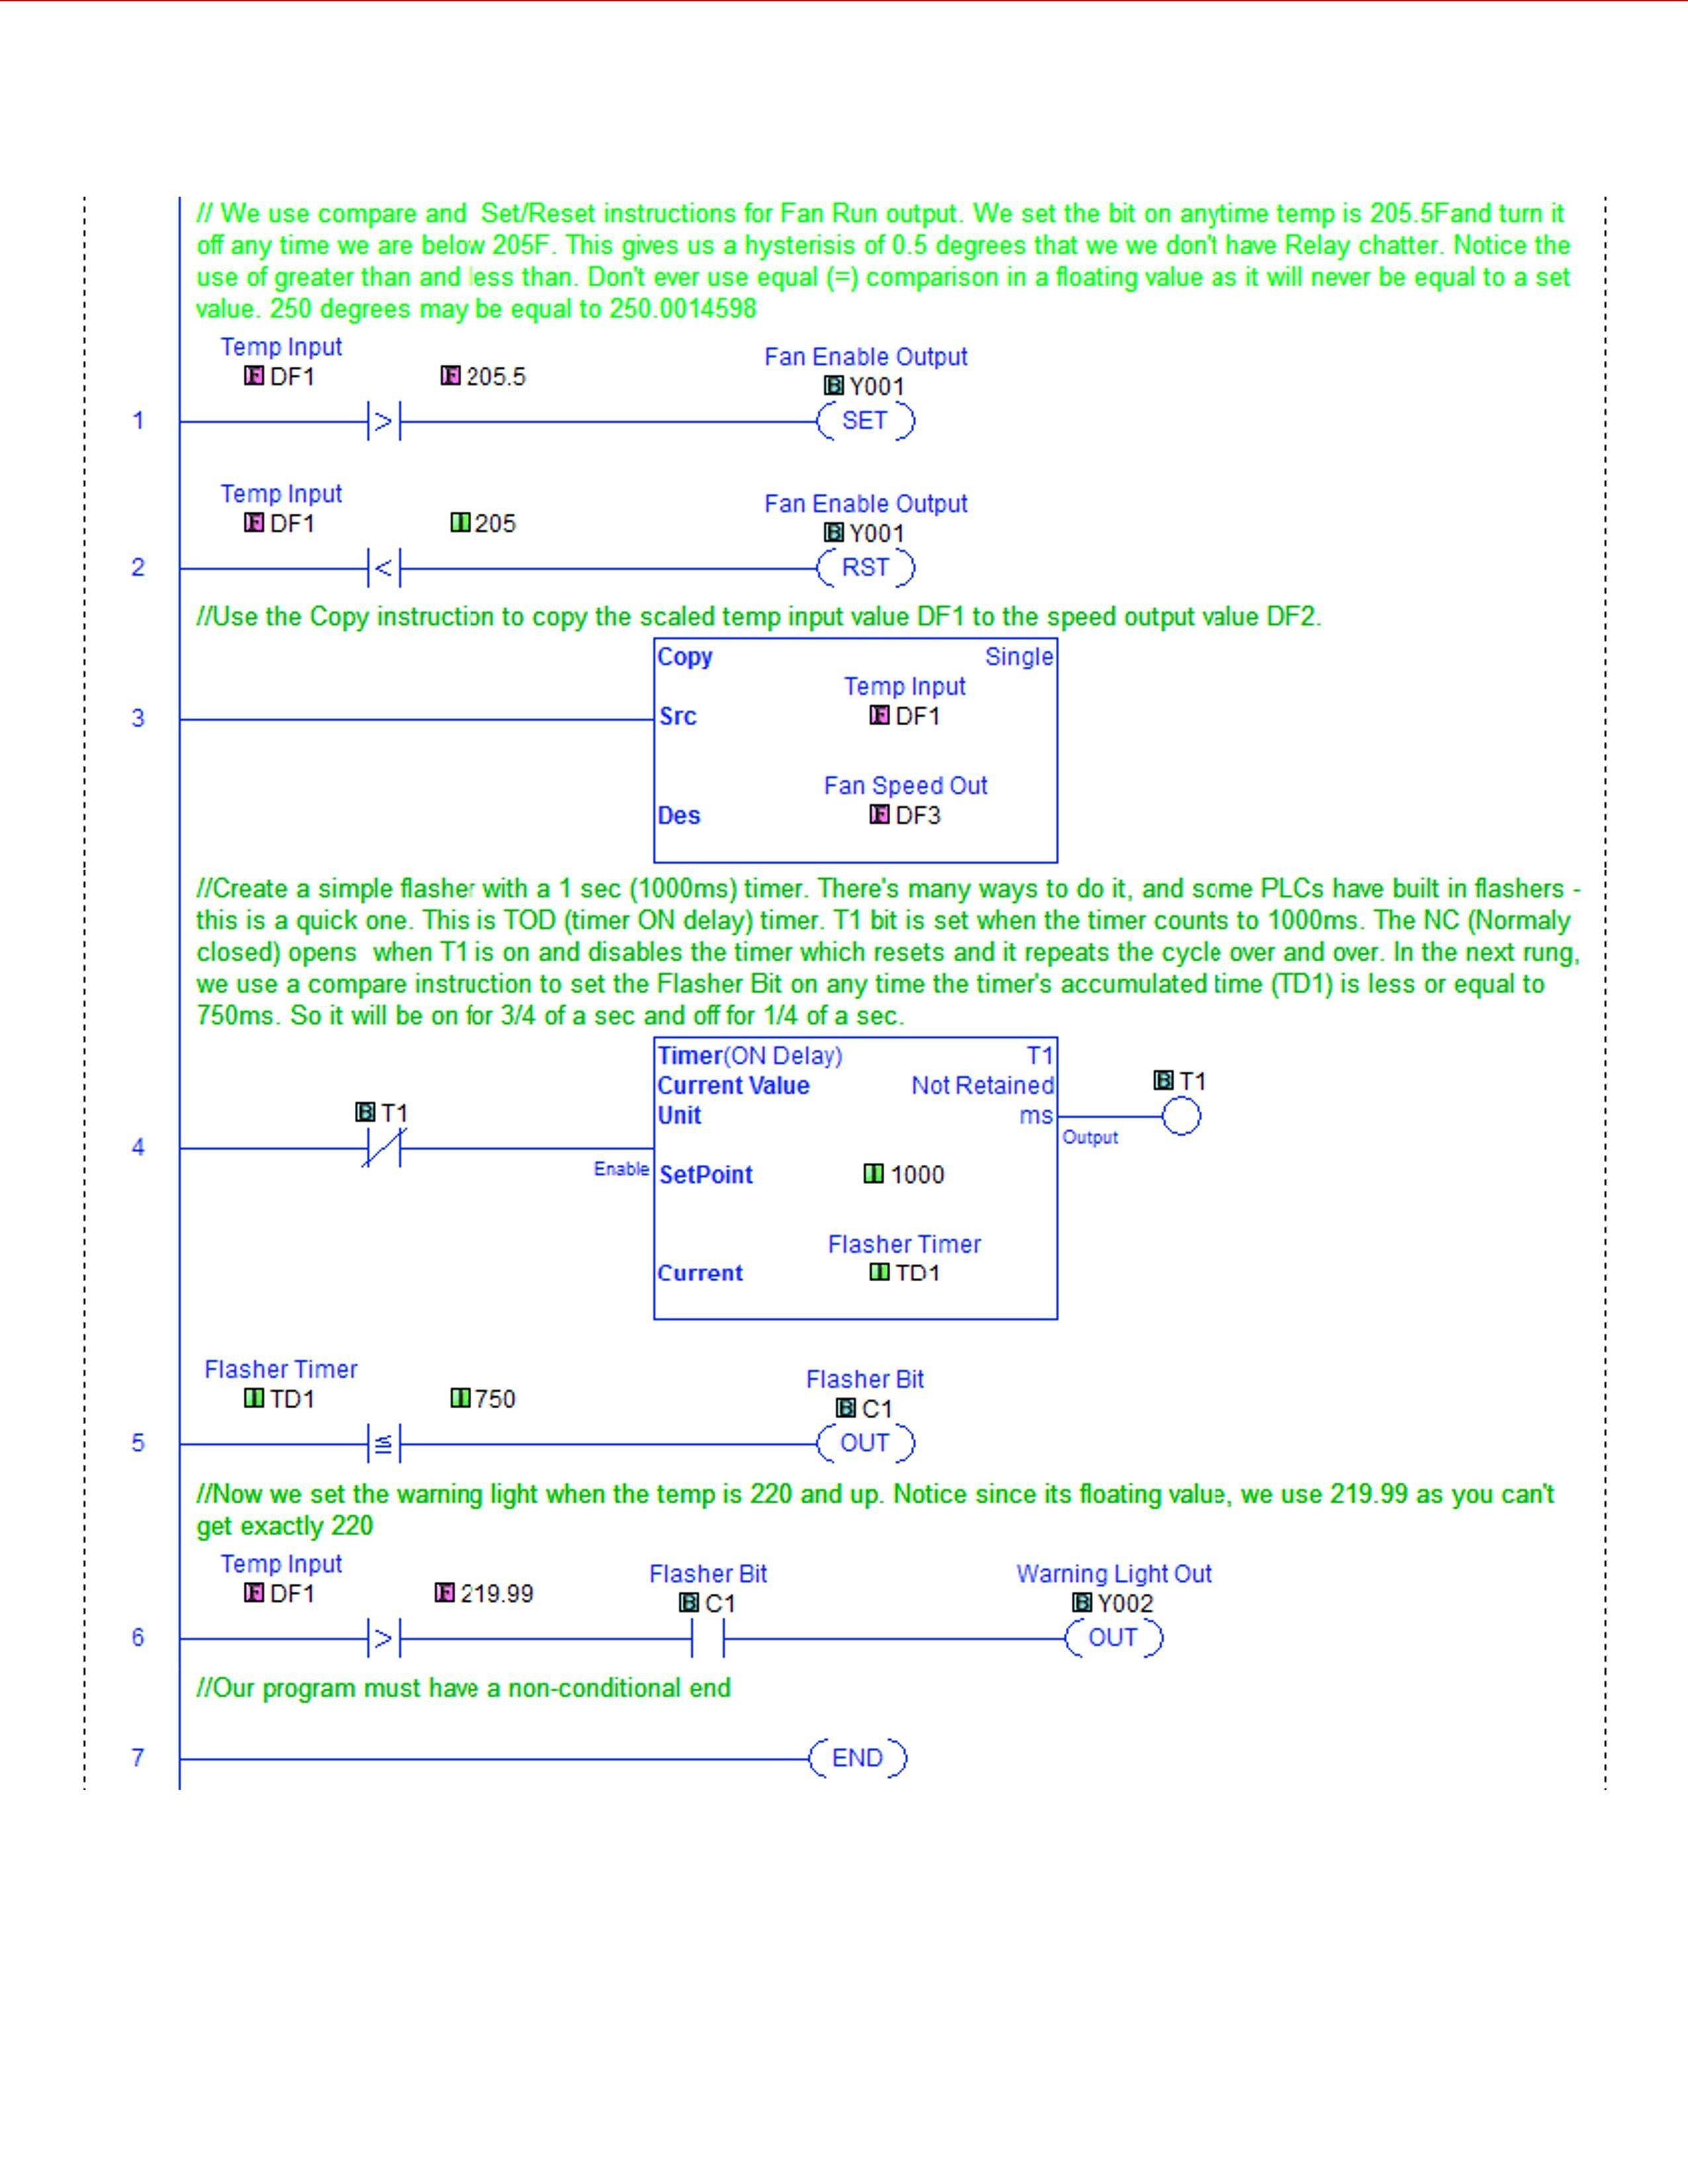 Car parking using plc ladder diagram introduction to programming car parking using plc ladder diagram ladder logic for plc program electrical engineering stack exchange of ccuart Gallery